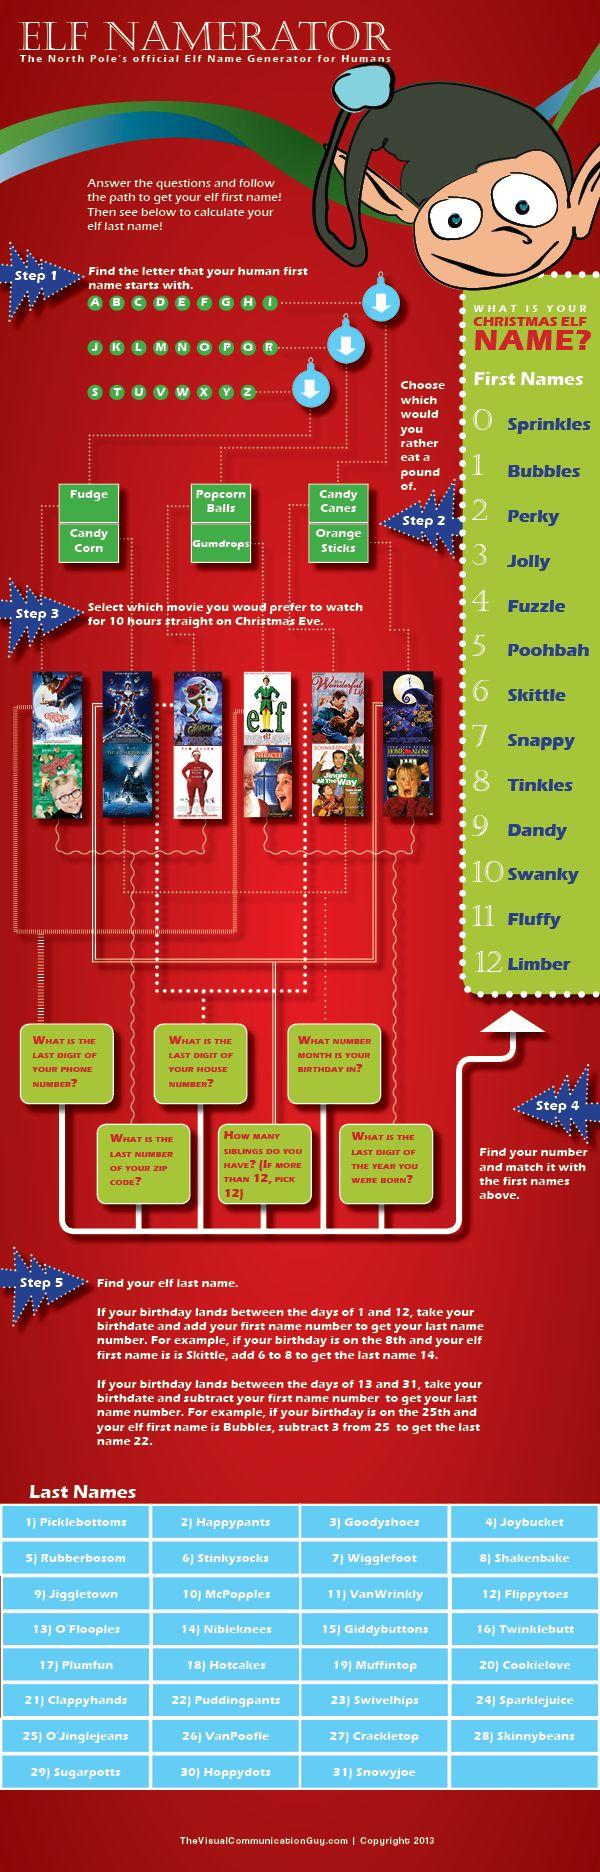 ElfNamerator: find your Christmas elf name